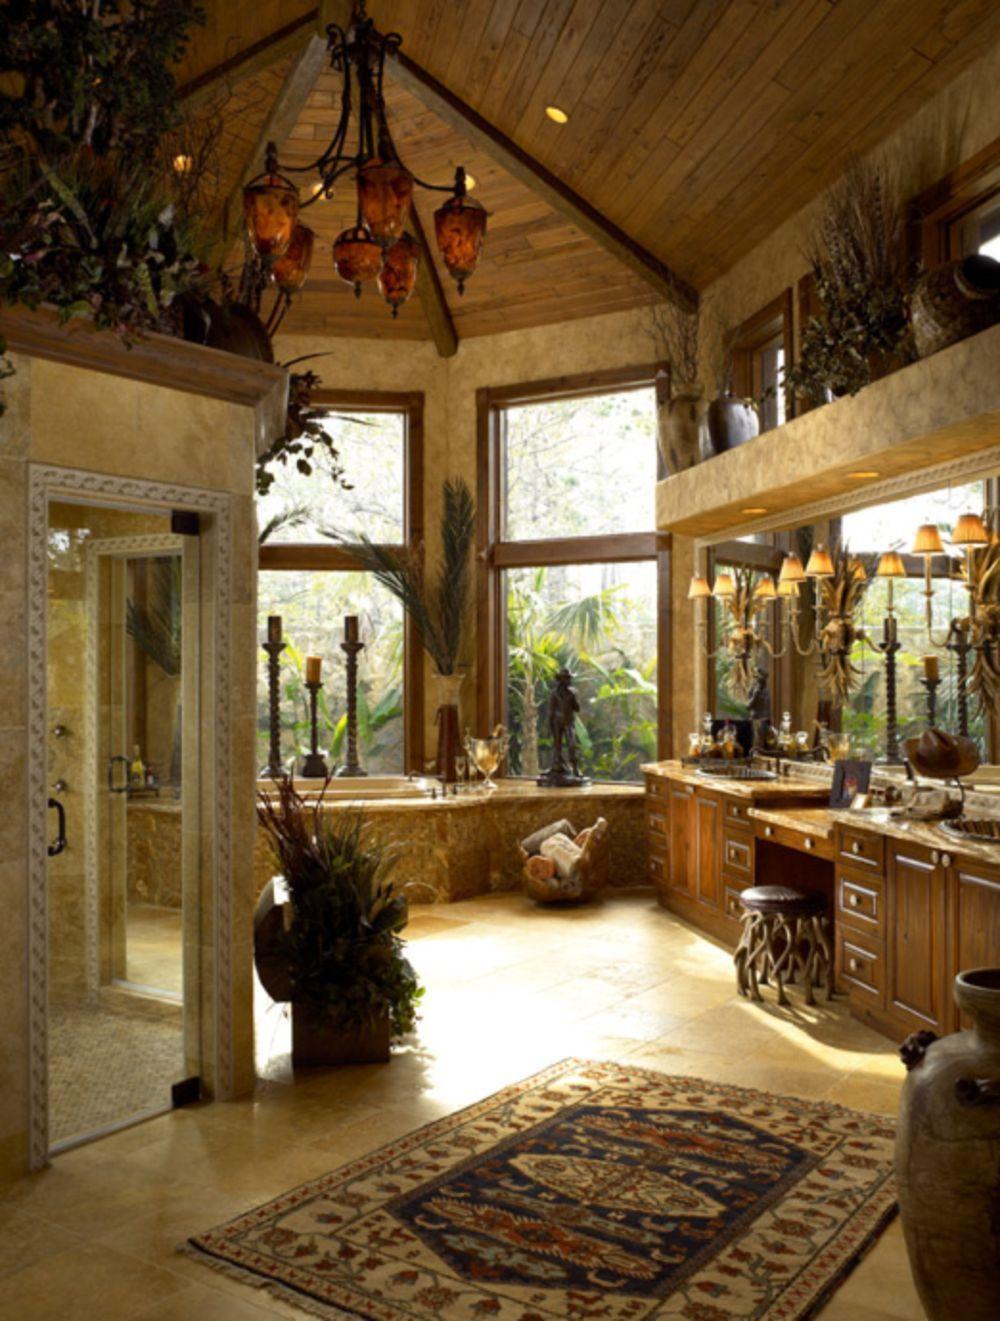 Mediterranean Bathroom Design Prepossessing Breathtaking 40 Fabulous Mediterranean Bathroom Design Ideas Https Review